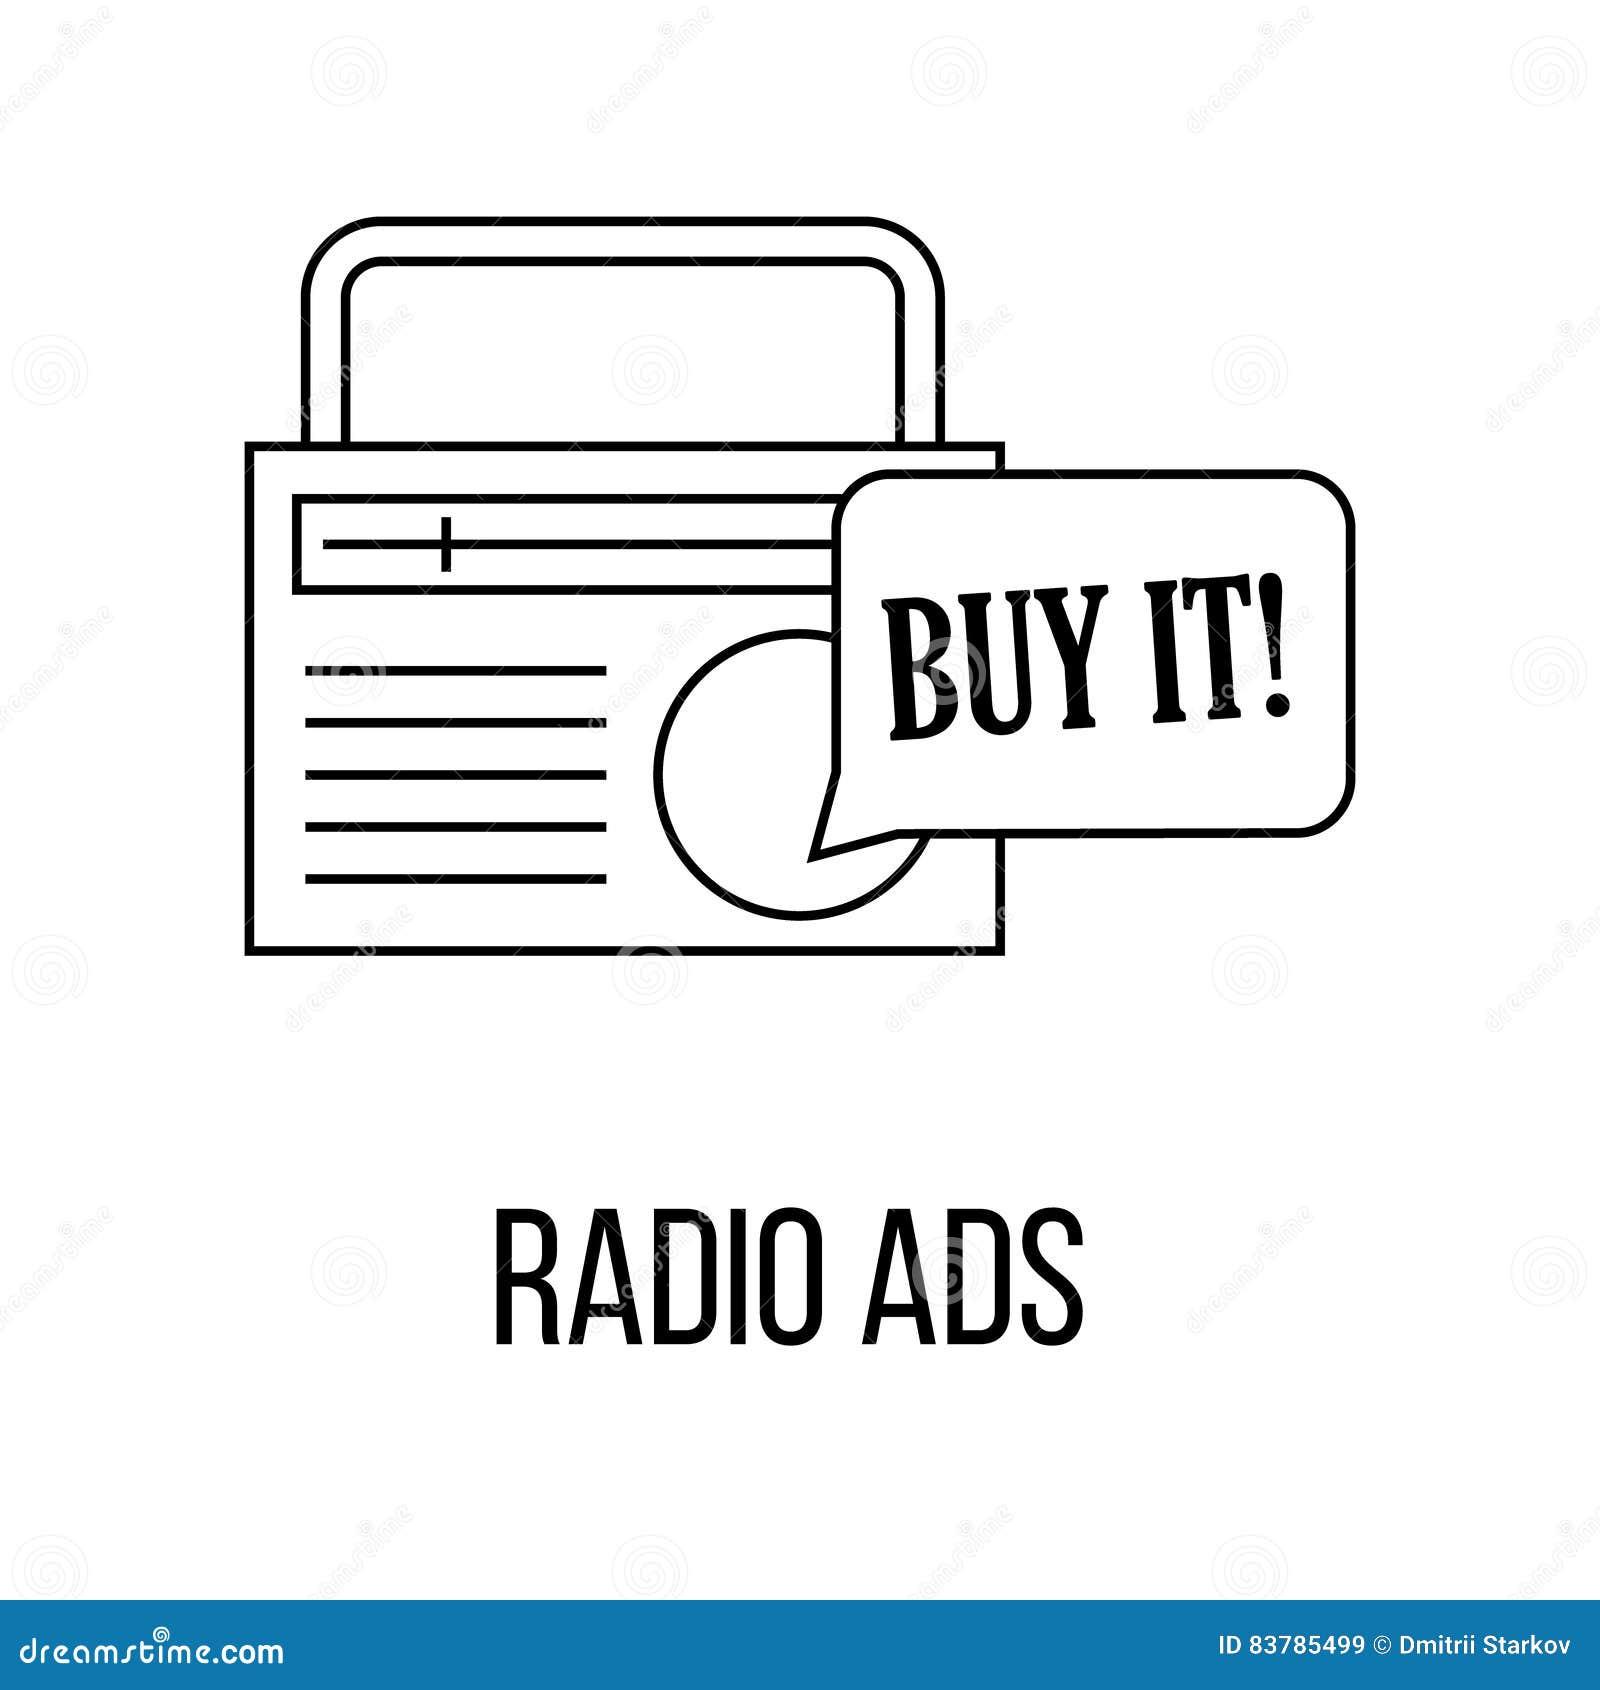 Download internet radio ad load report q4 2015: advertisers grow.